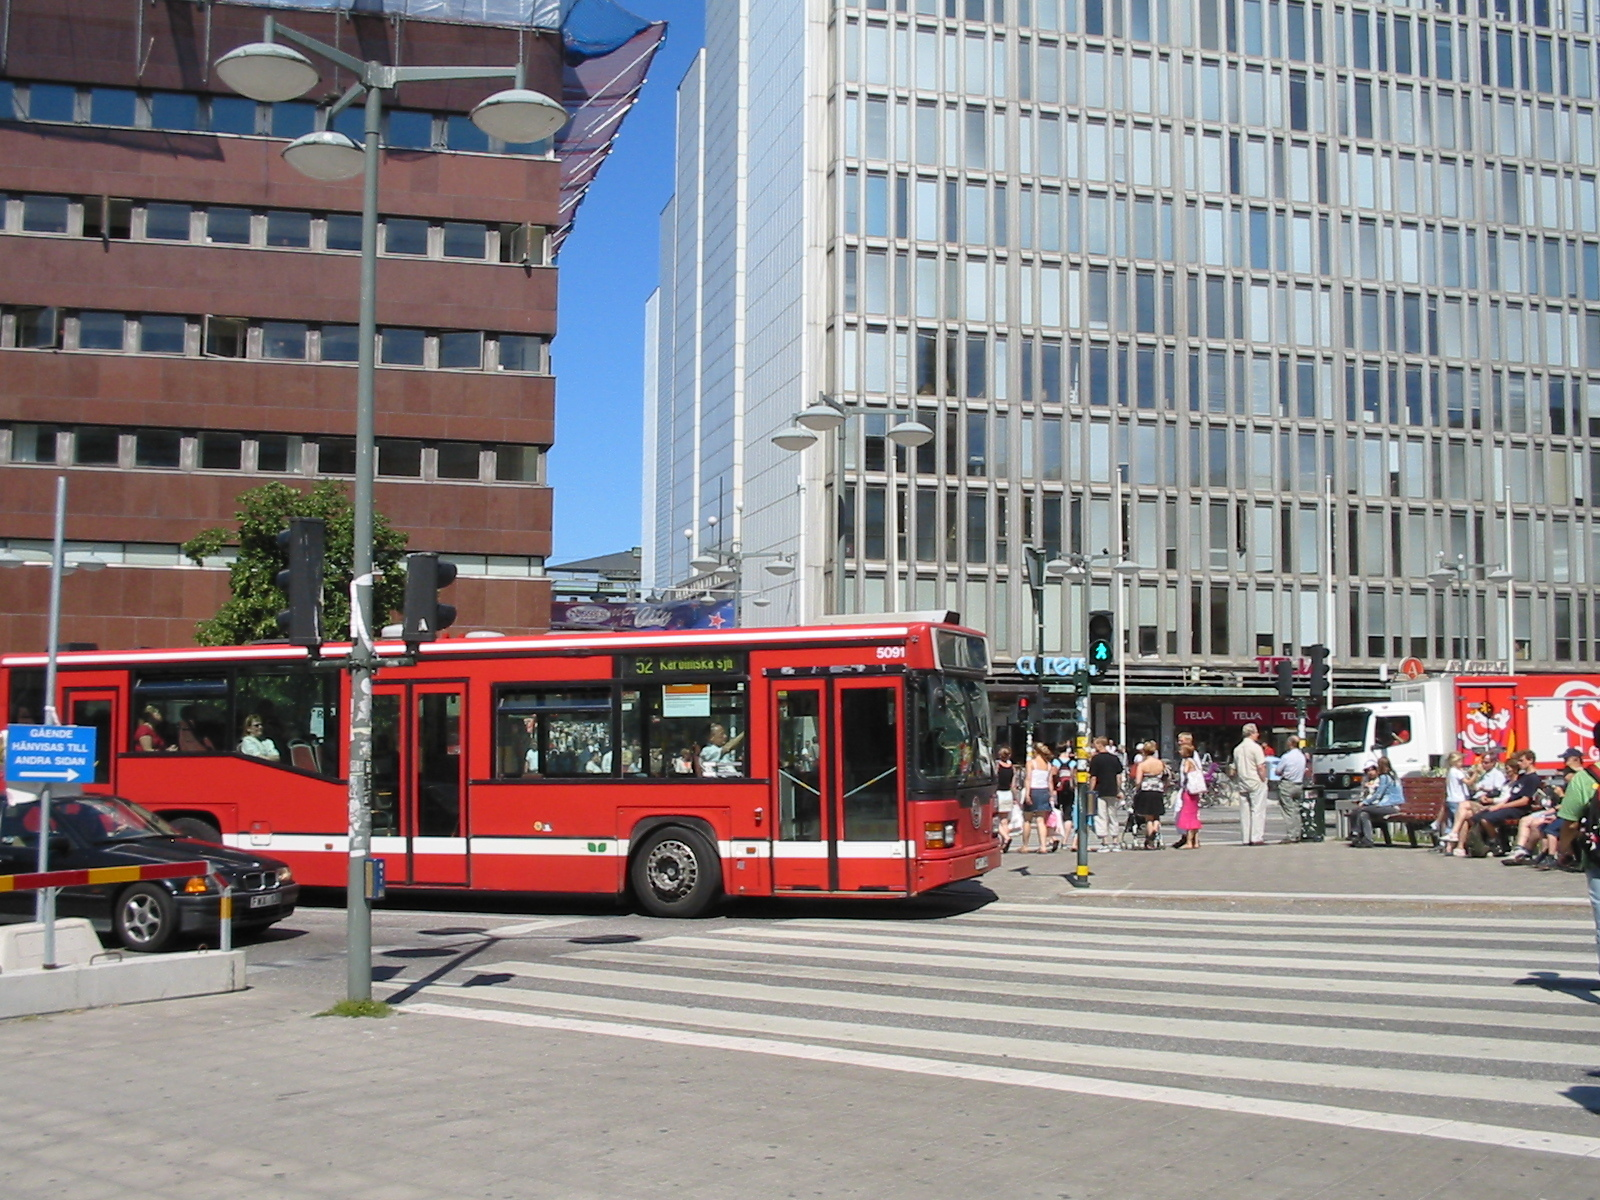 Bus, Stockholm